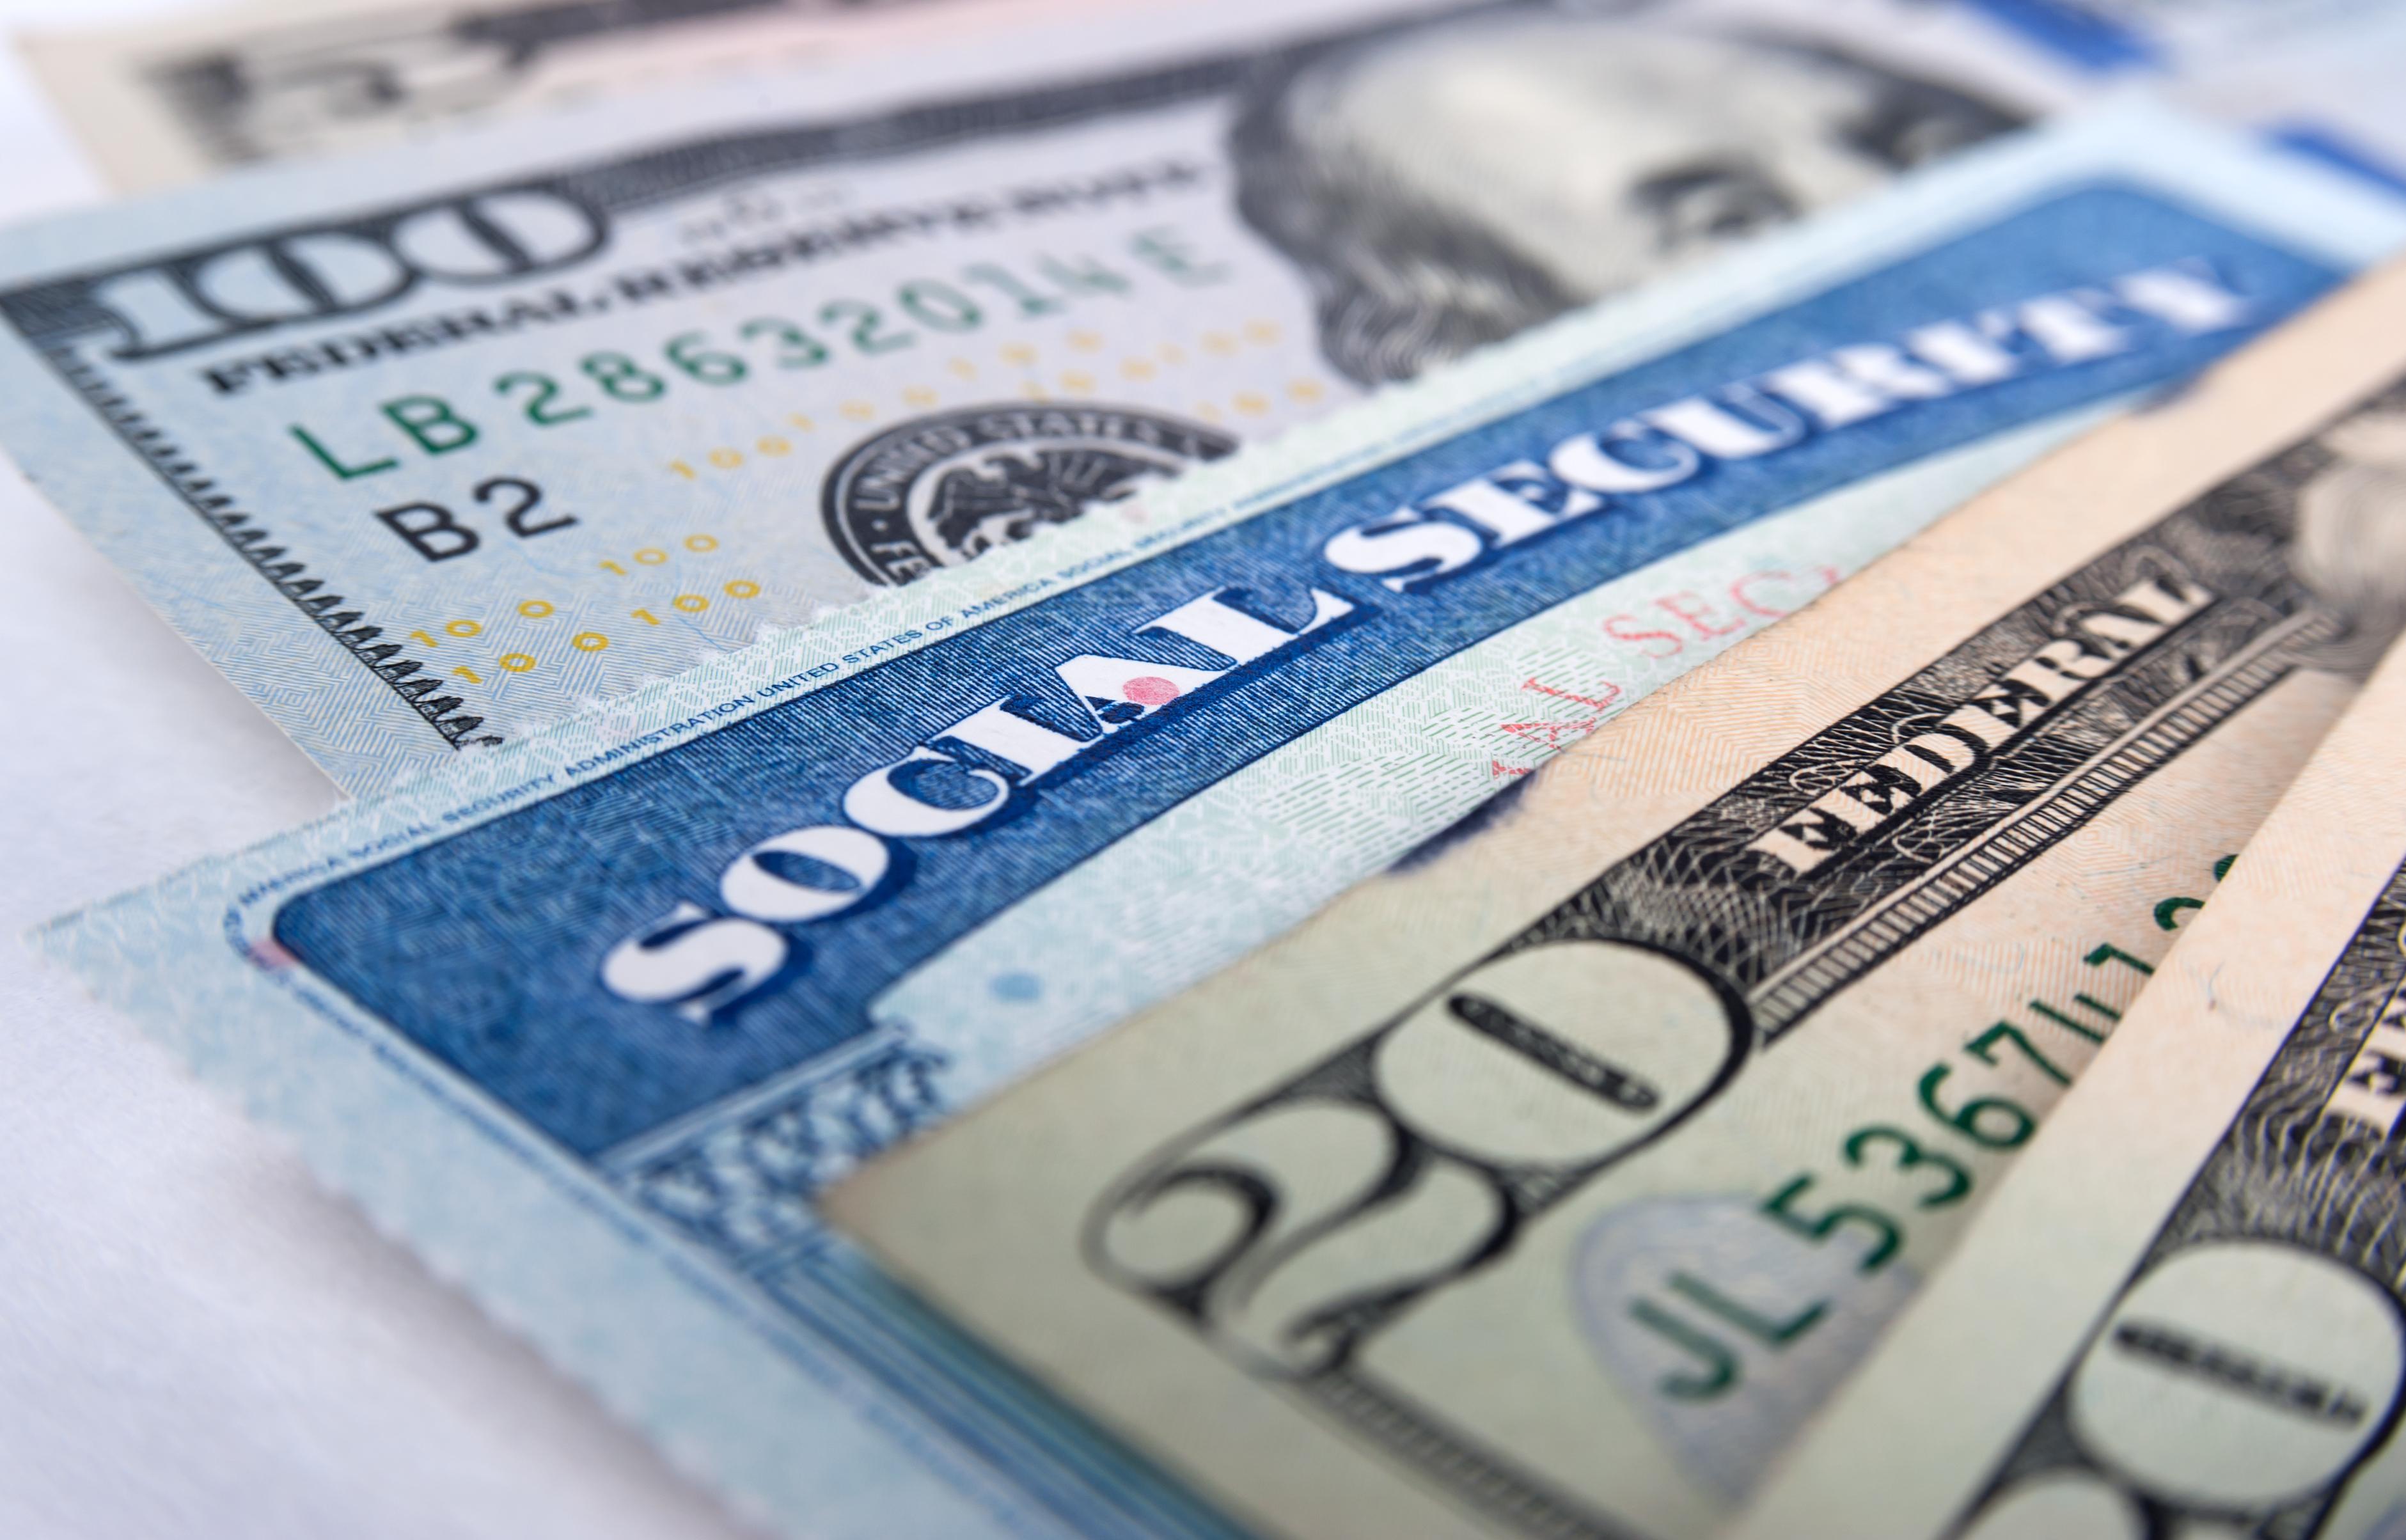 A Social Security card wedged between cash bills.